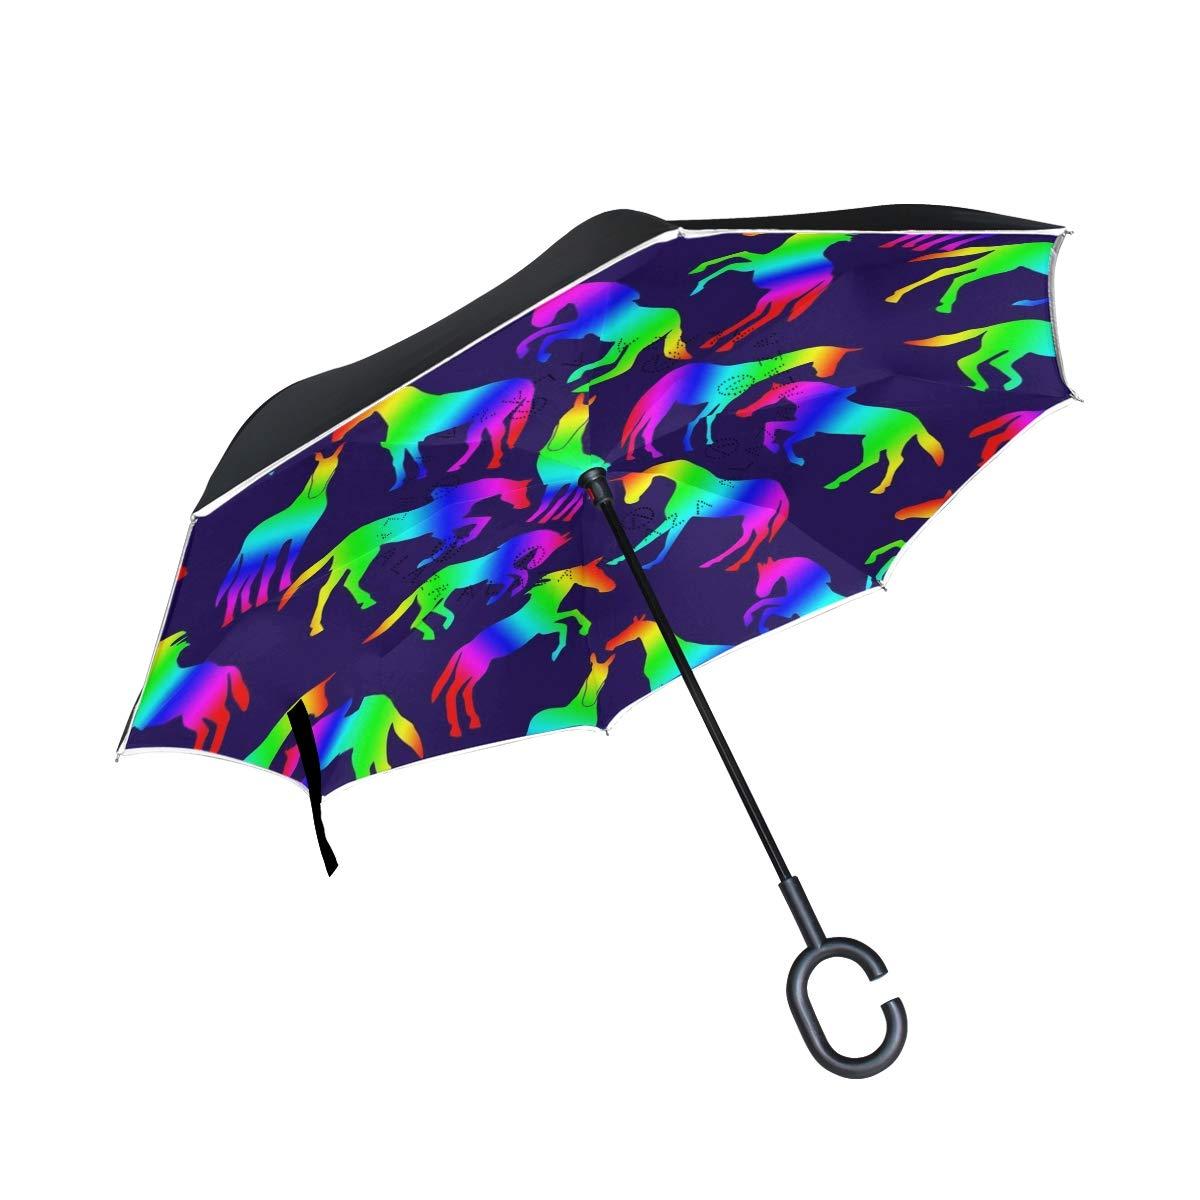 DOPKEEP Rainbow Horses Fun Celebrate Double Layer Inverted Umbrella Cars Reverse Umbrella,UV Protection Windproof Large Straight Umbrella for Car Rain Outdoor with C-Shaped Handle